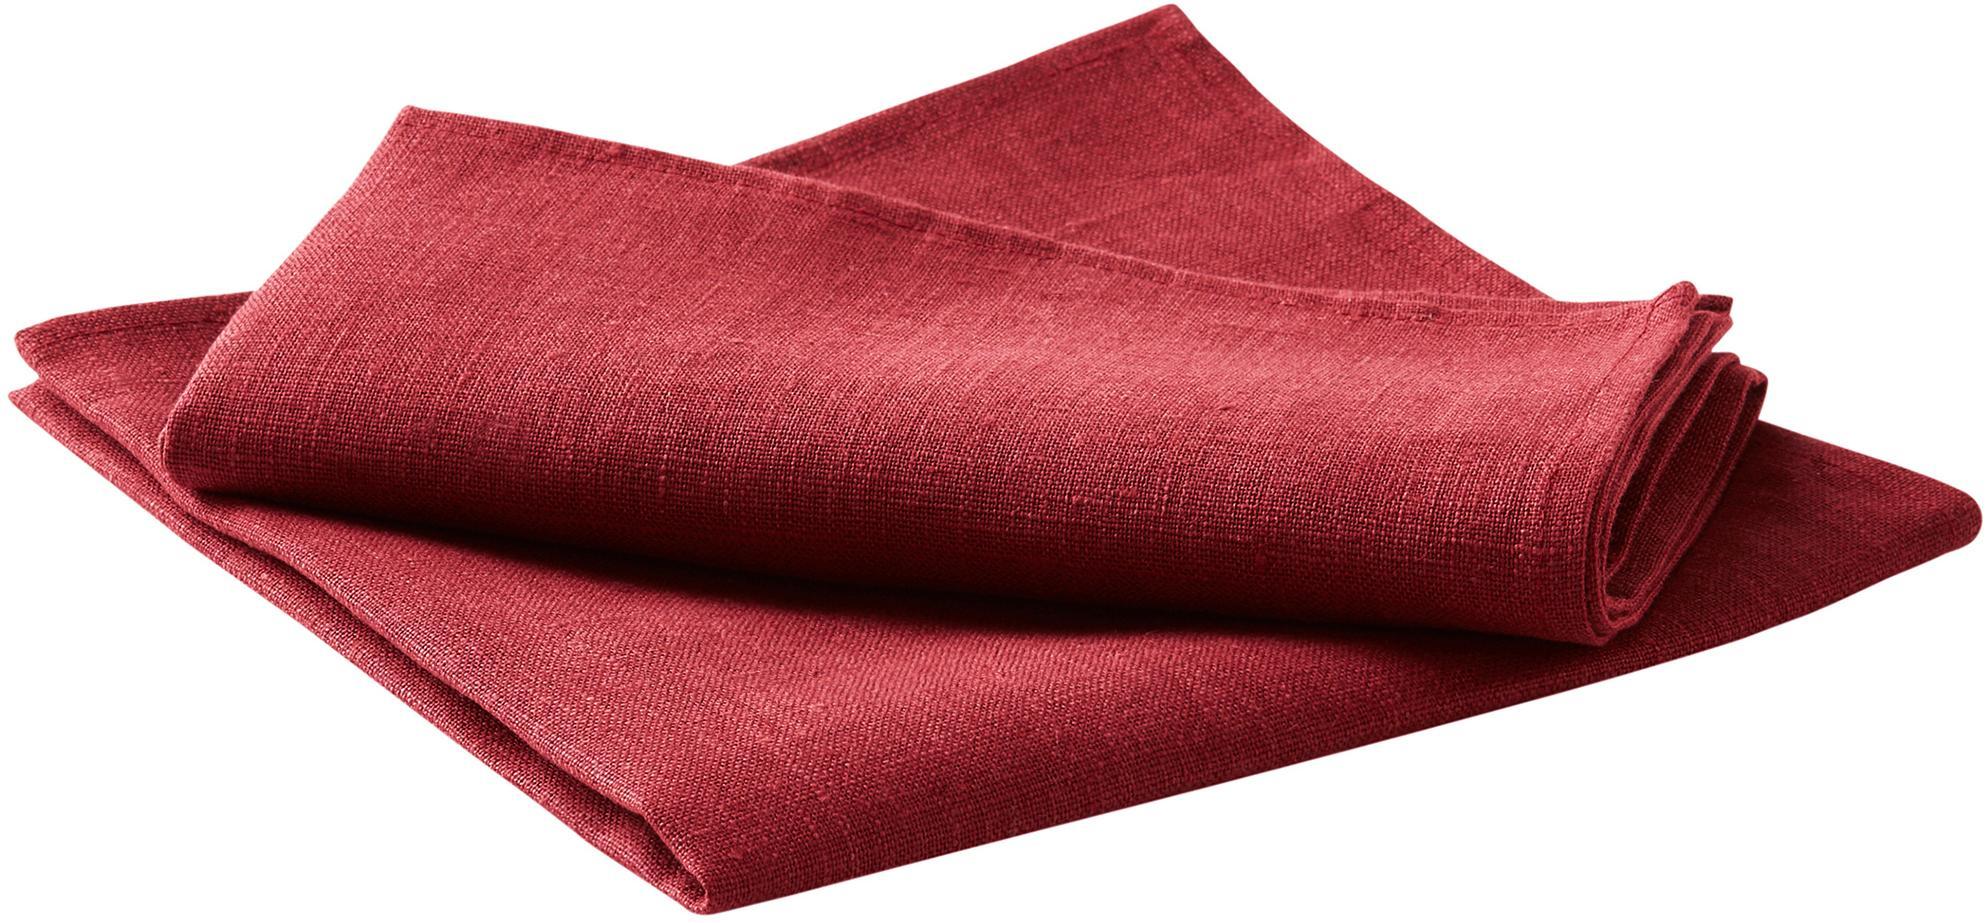 Linnen servetten Heddie, 2 stuks, 100% linnen, Rood, 45 x 45 cm